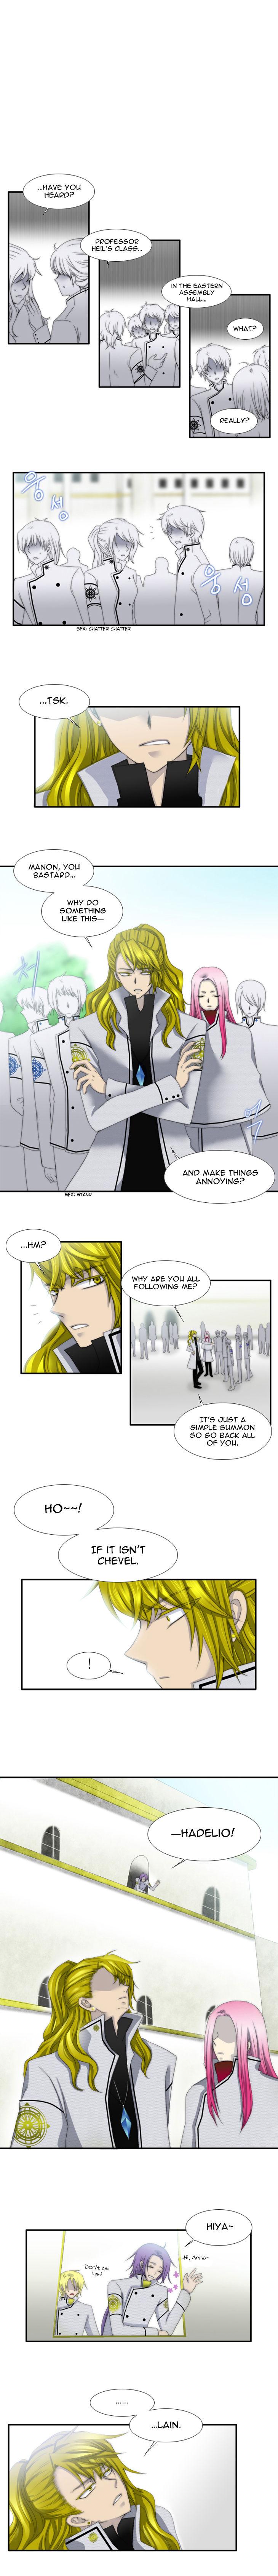 Black Haze 27 Page 1